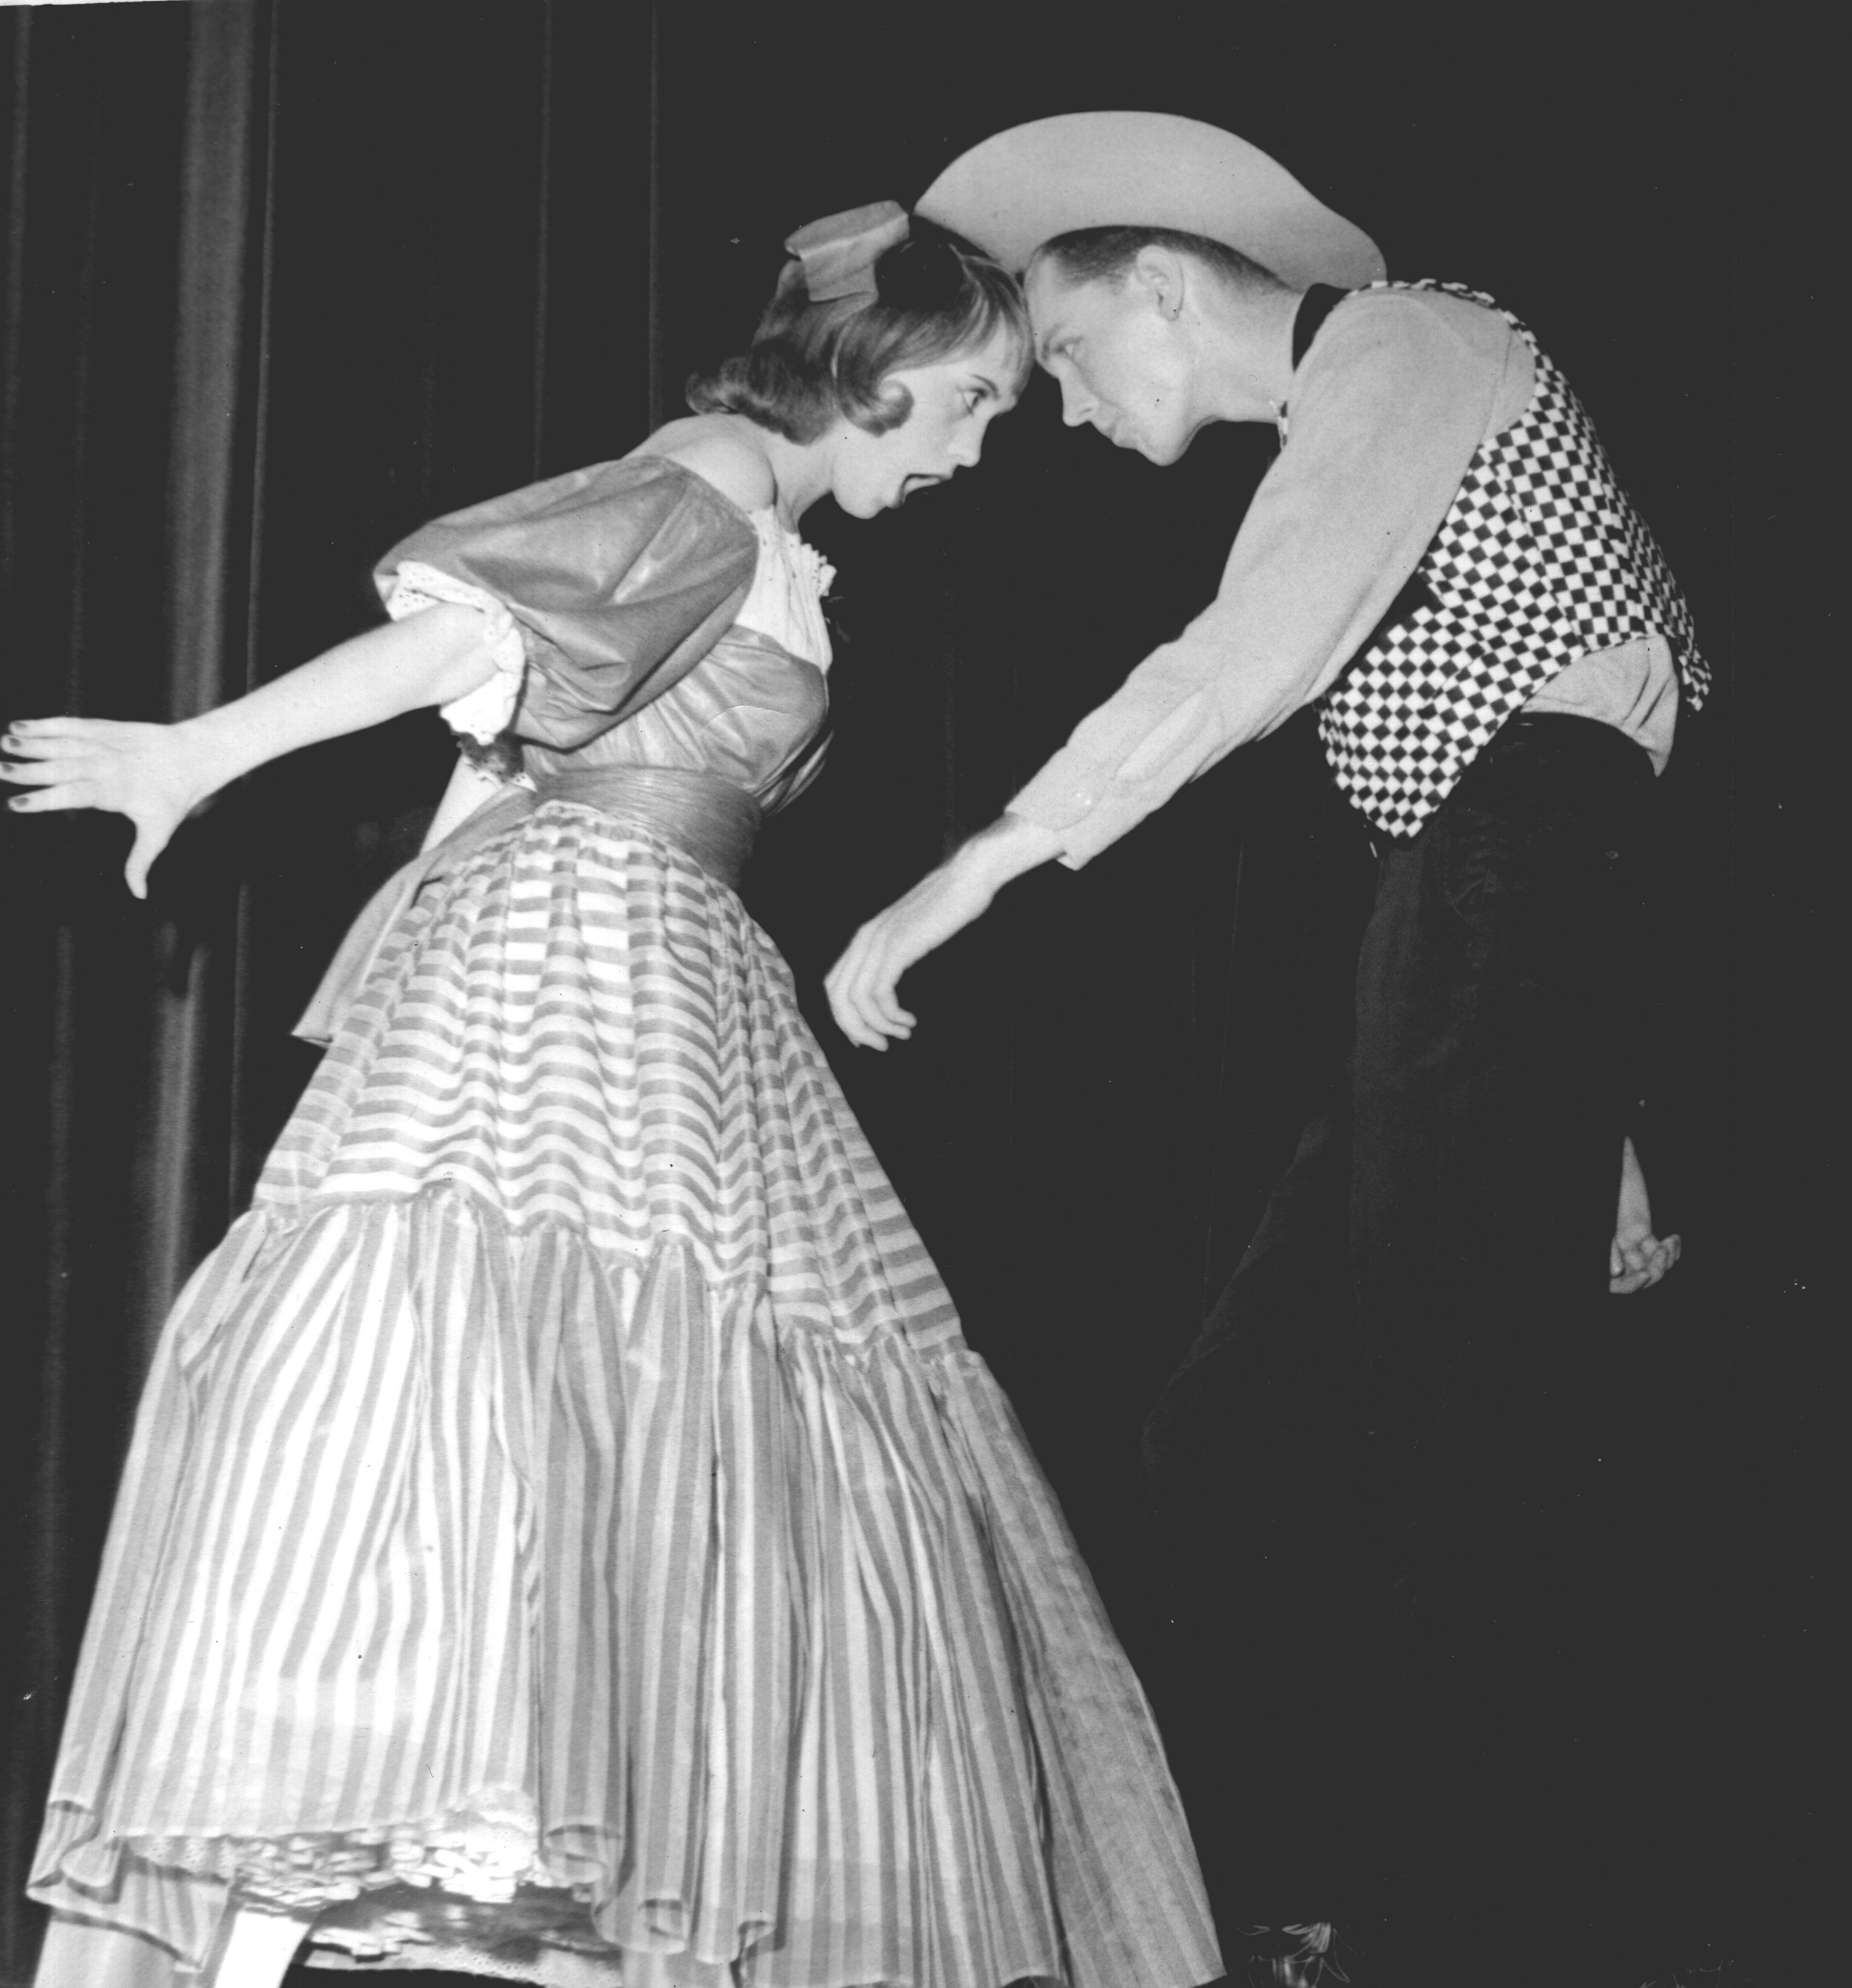 File Oklahoma 1958 Ado Annie Kathy Johnson Will Parker Duward Sumner Jpg Wikimedia Commons